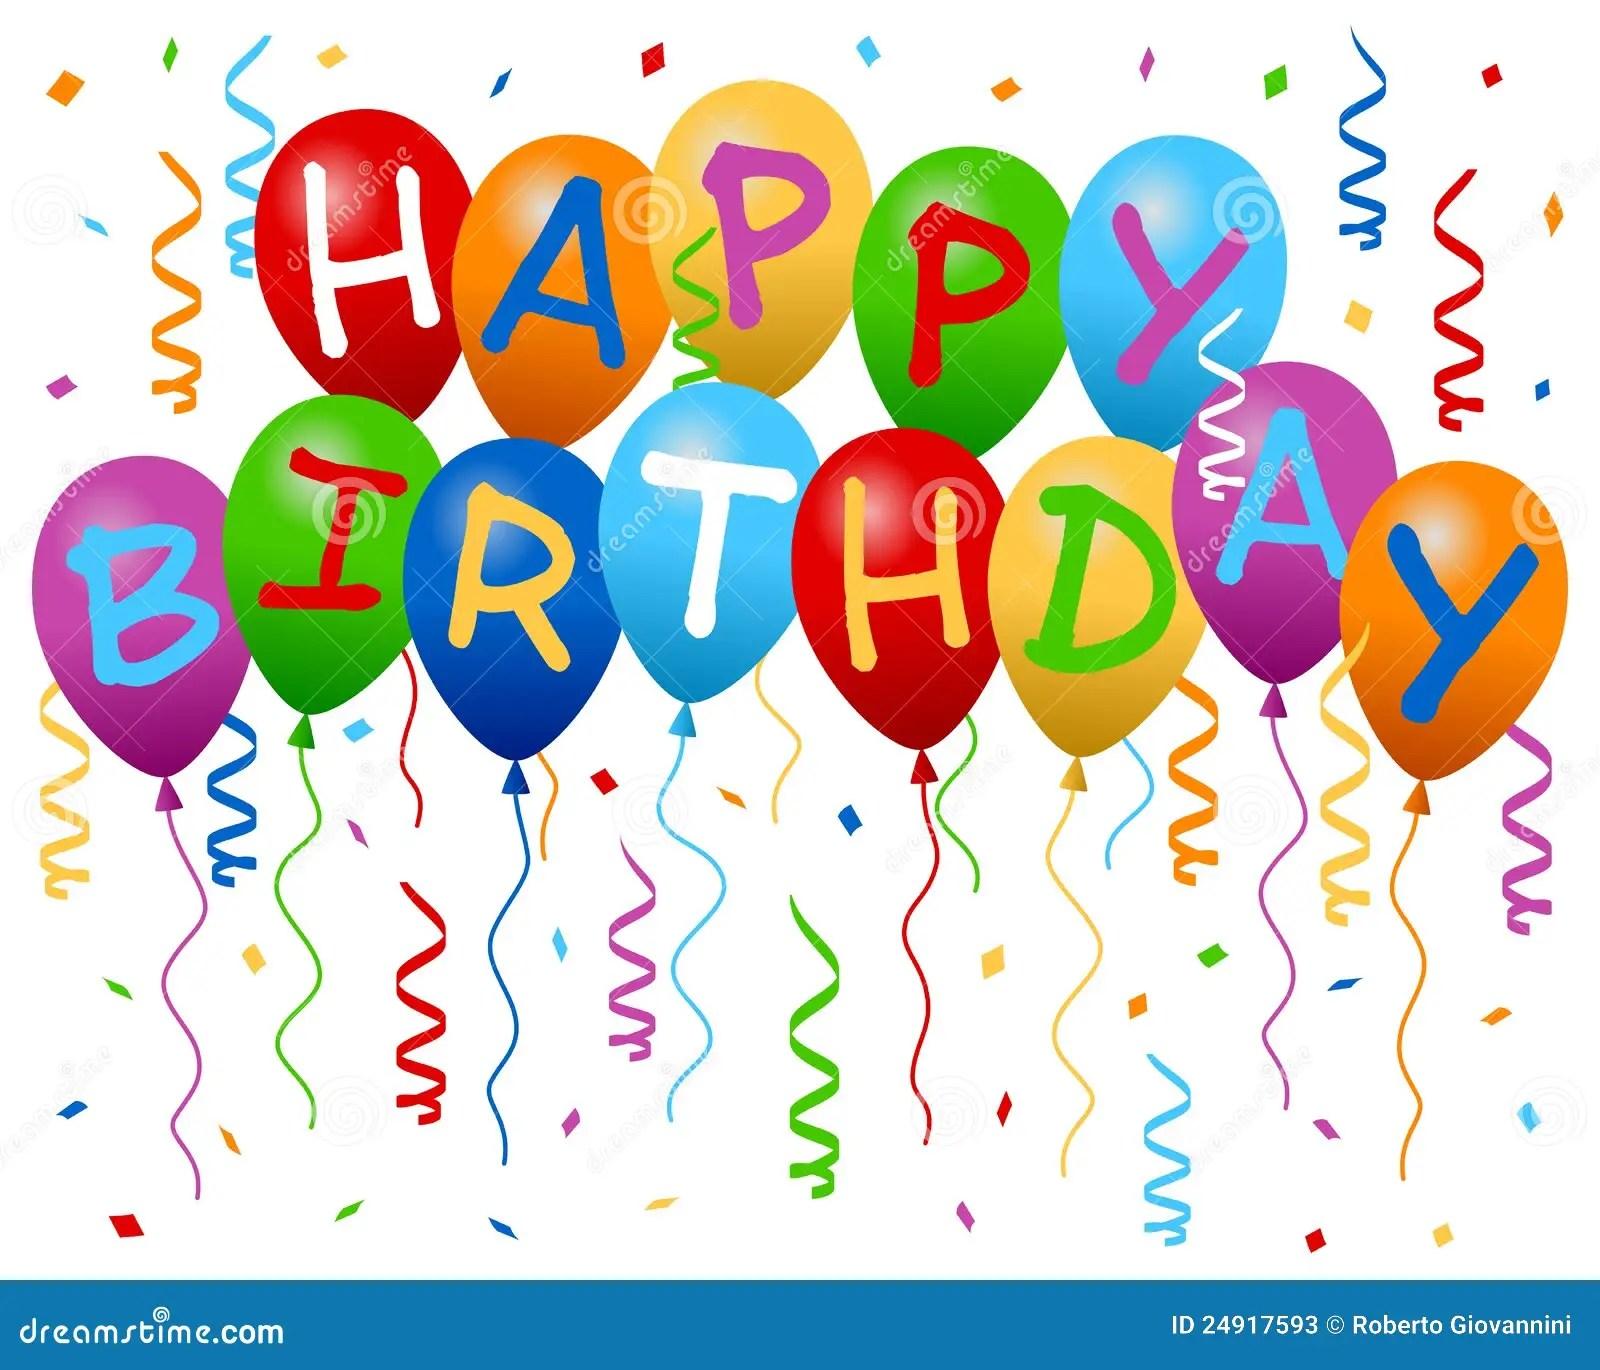 Birthday Balloons Stock Illustrations 71 256 Birthday Balloons Stock Illustrations Vectors Clipart Dreamstime